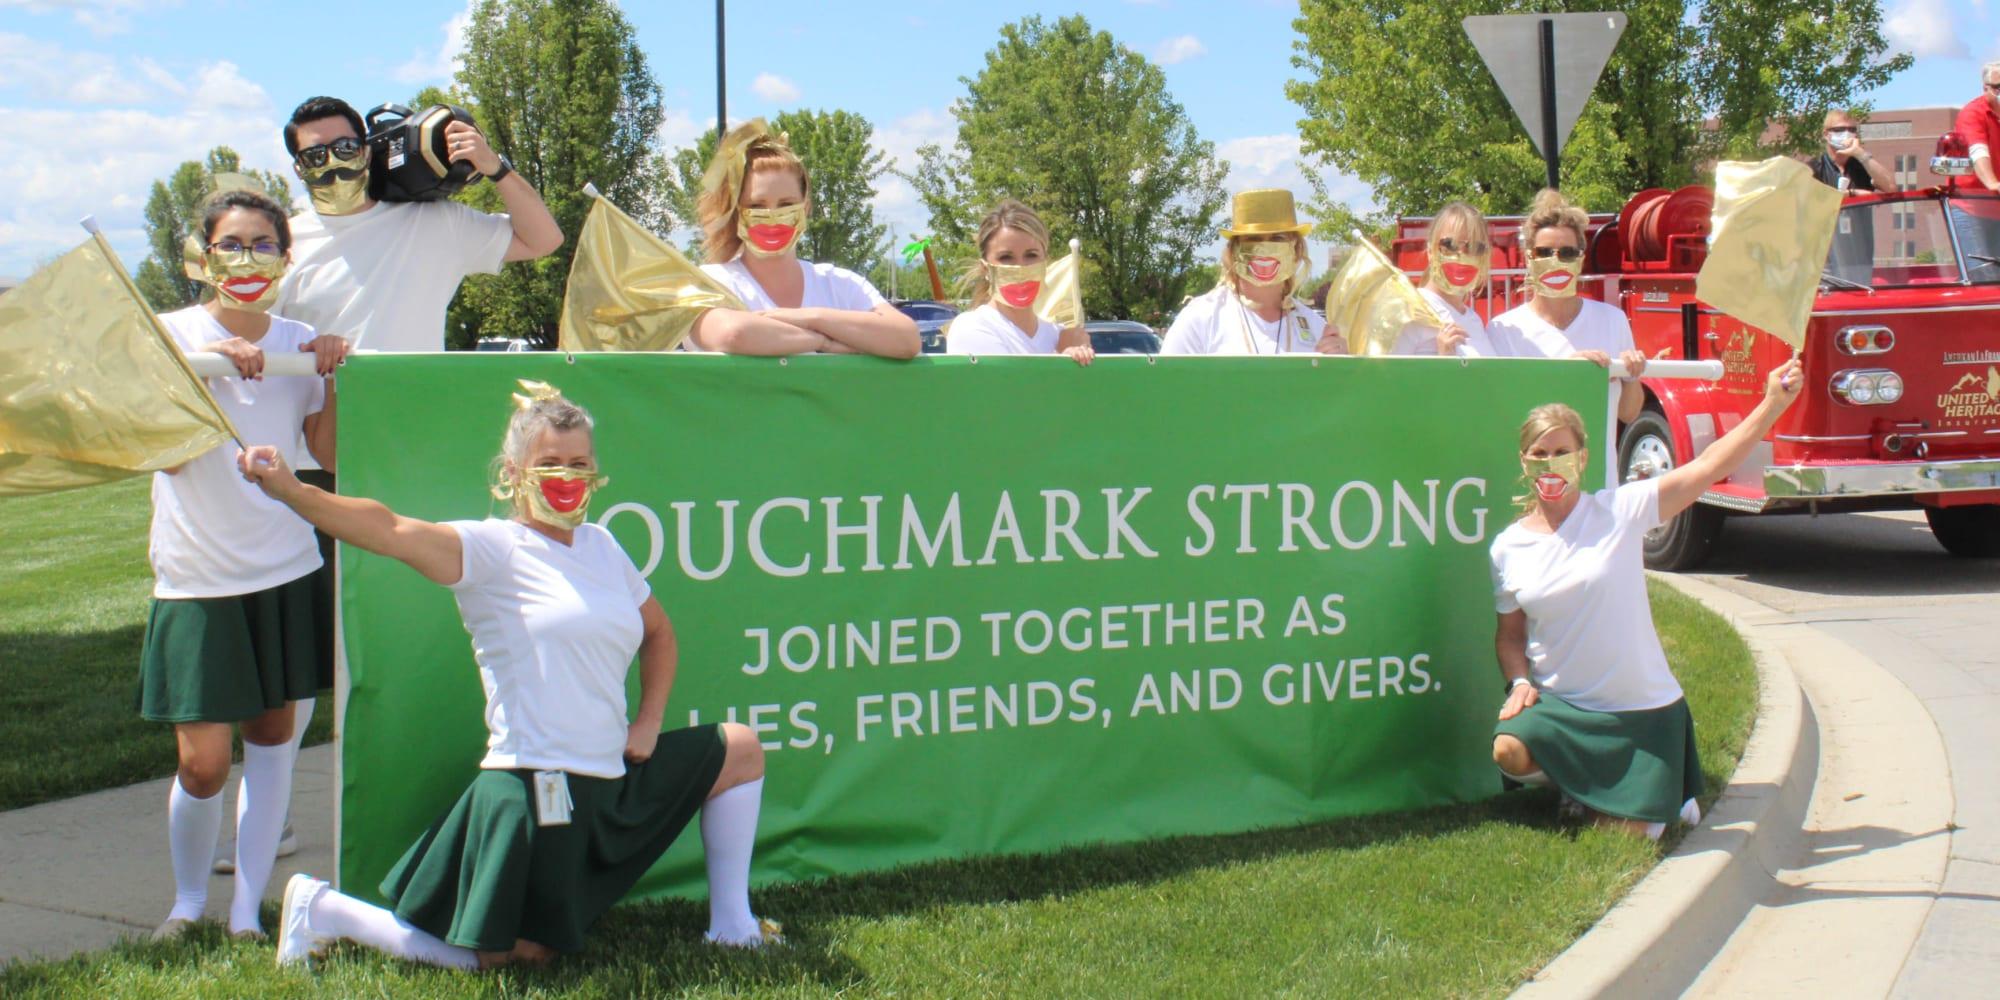 Touchmark Central Office in Beaverton, Oregon